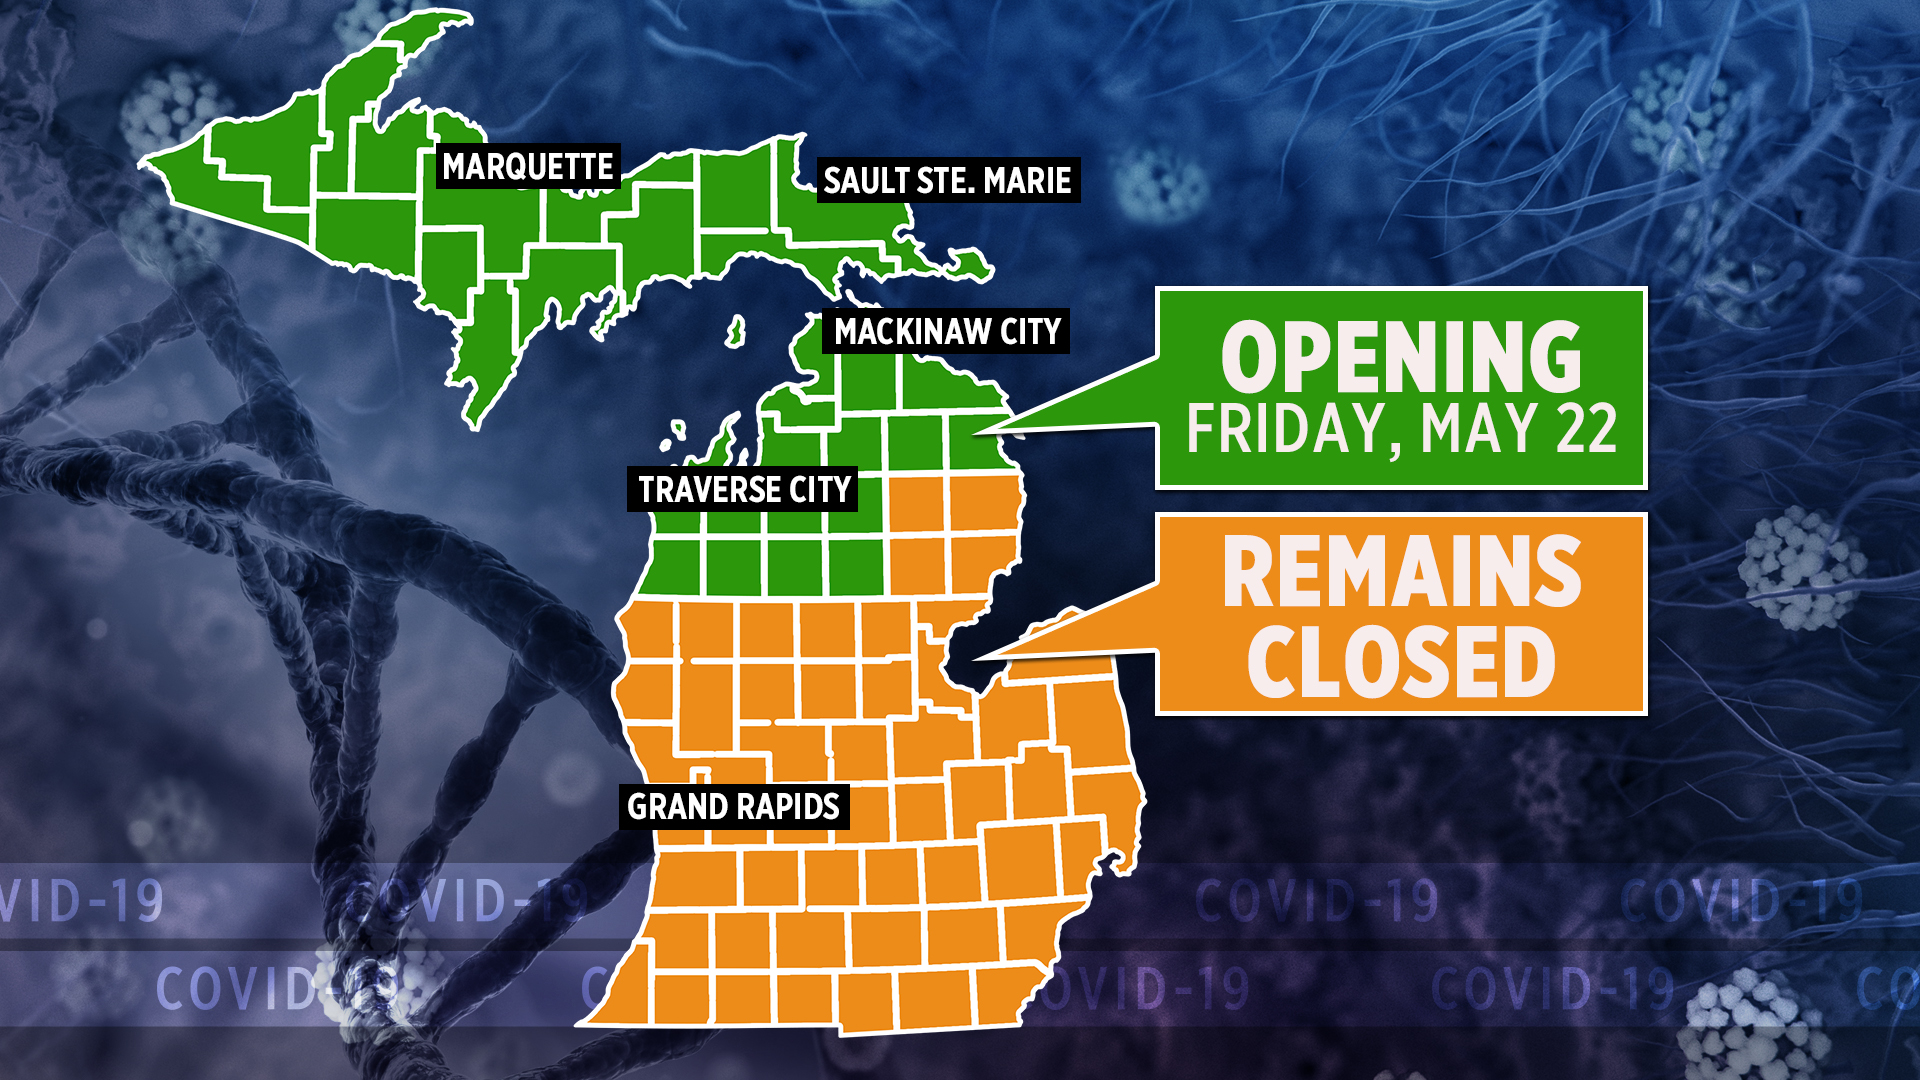 Restaurants Open Christmas Eve 2020 Detroit Mi Whitmer: Restaurants, shops can open in northern Michigan | WOODTV.com